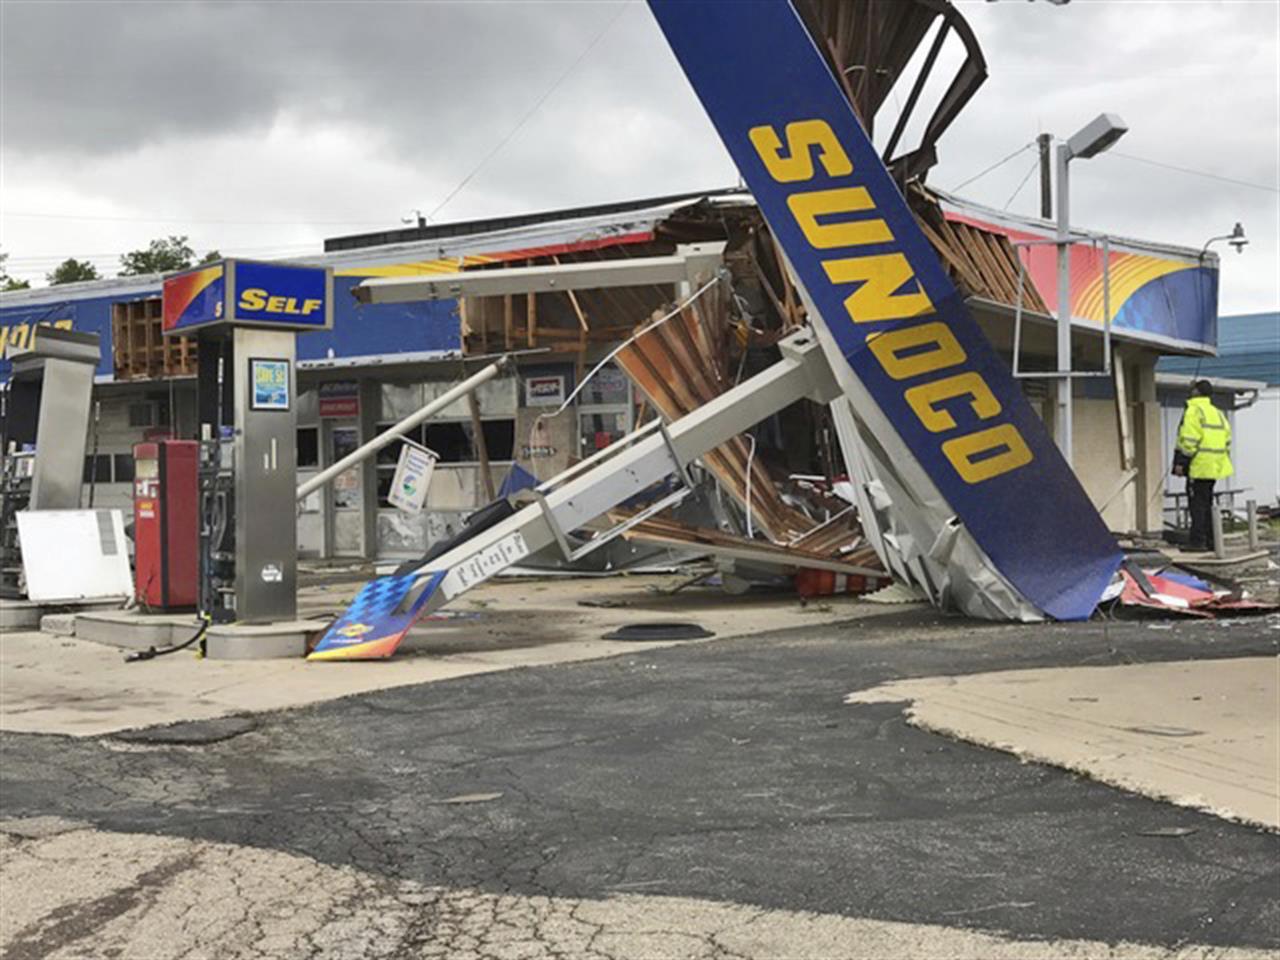 Ohio clark county new carlisle -  Interrupt Graduation Ohio Tornadoes Damage Businesses Interrupt Graduation